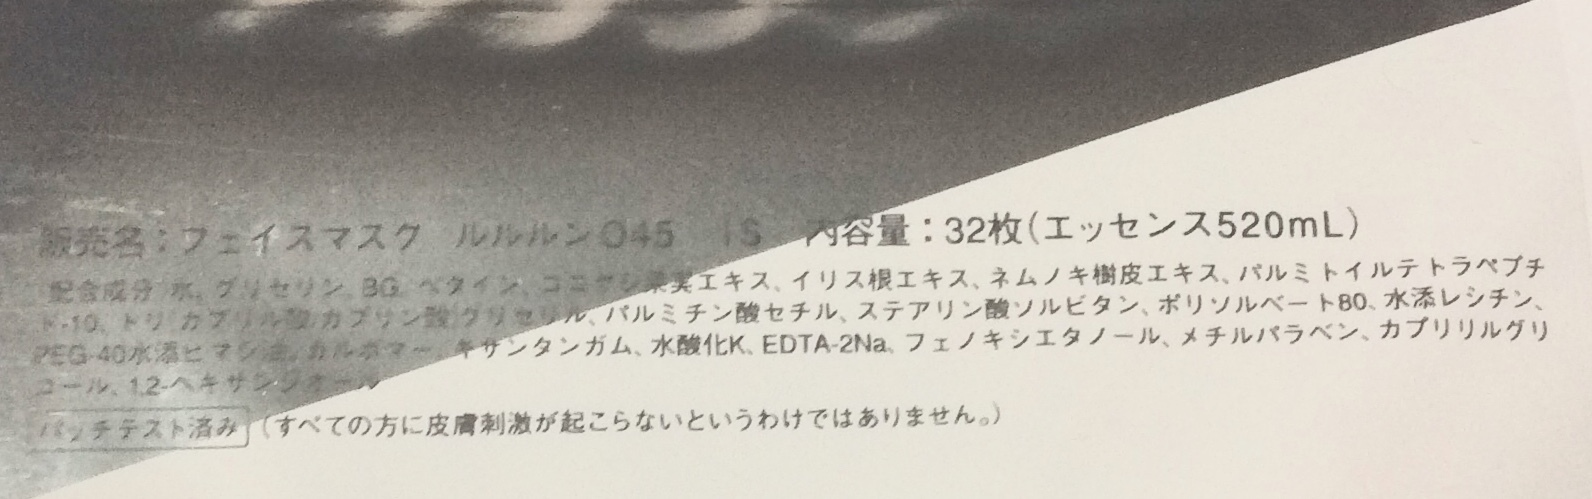 C1B0E95D-D618-4EBC-B6DF-37ABDBF20ED9.jpeg